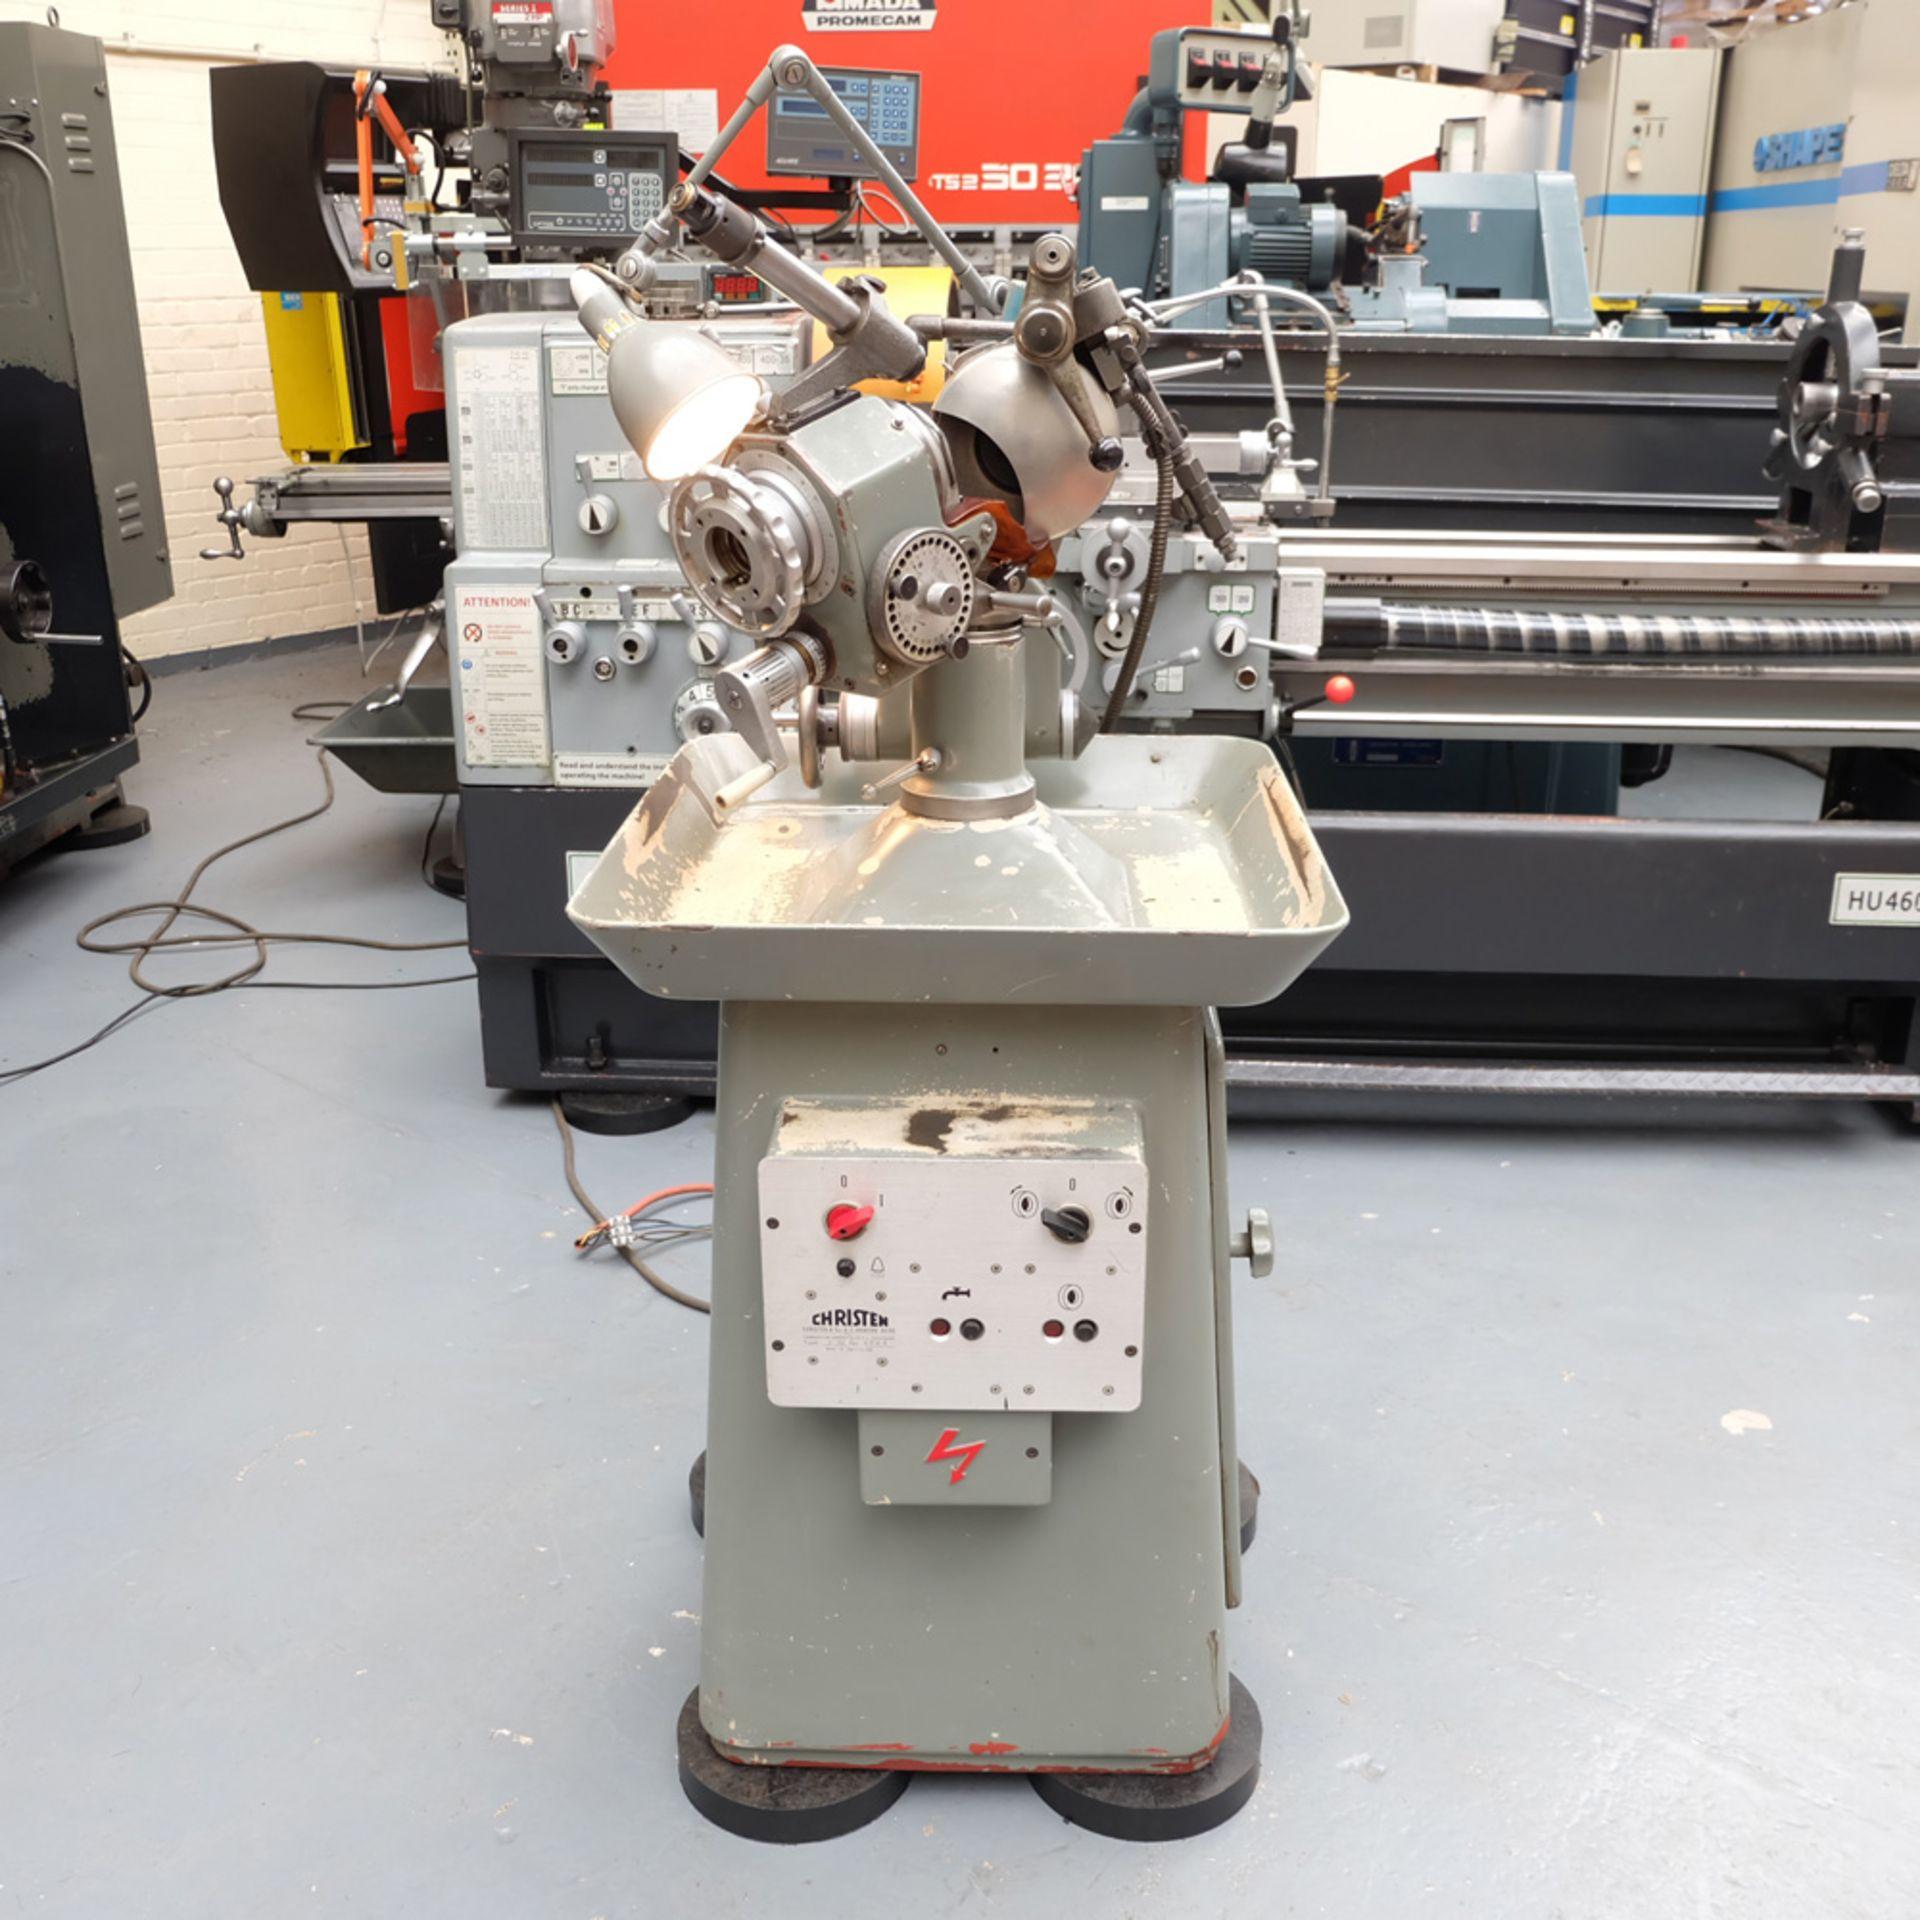 Christen Type 2-32 Twist Drill Grinding Machine. - Image 2 of 14